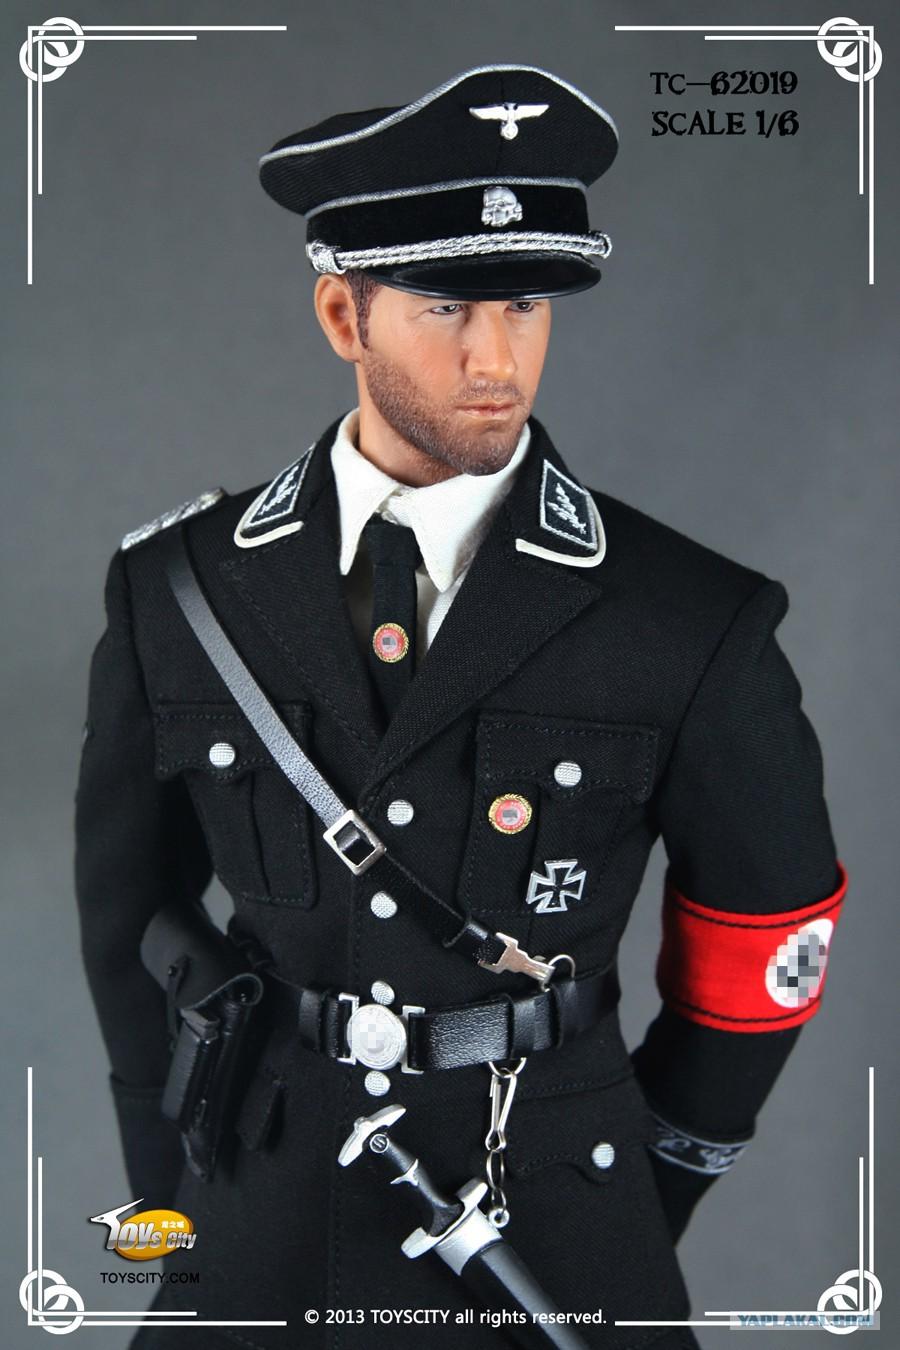 German Waffen SS Uniforms  WW2SALE